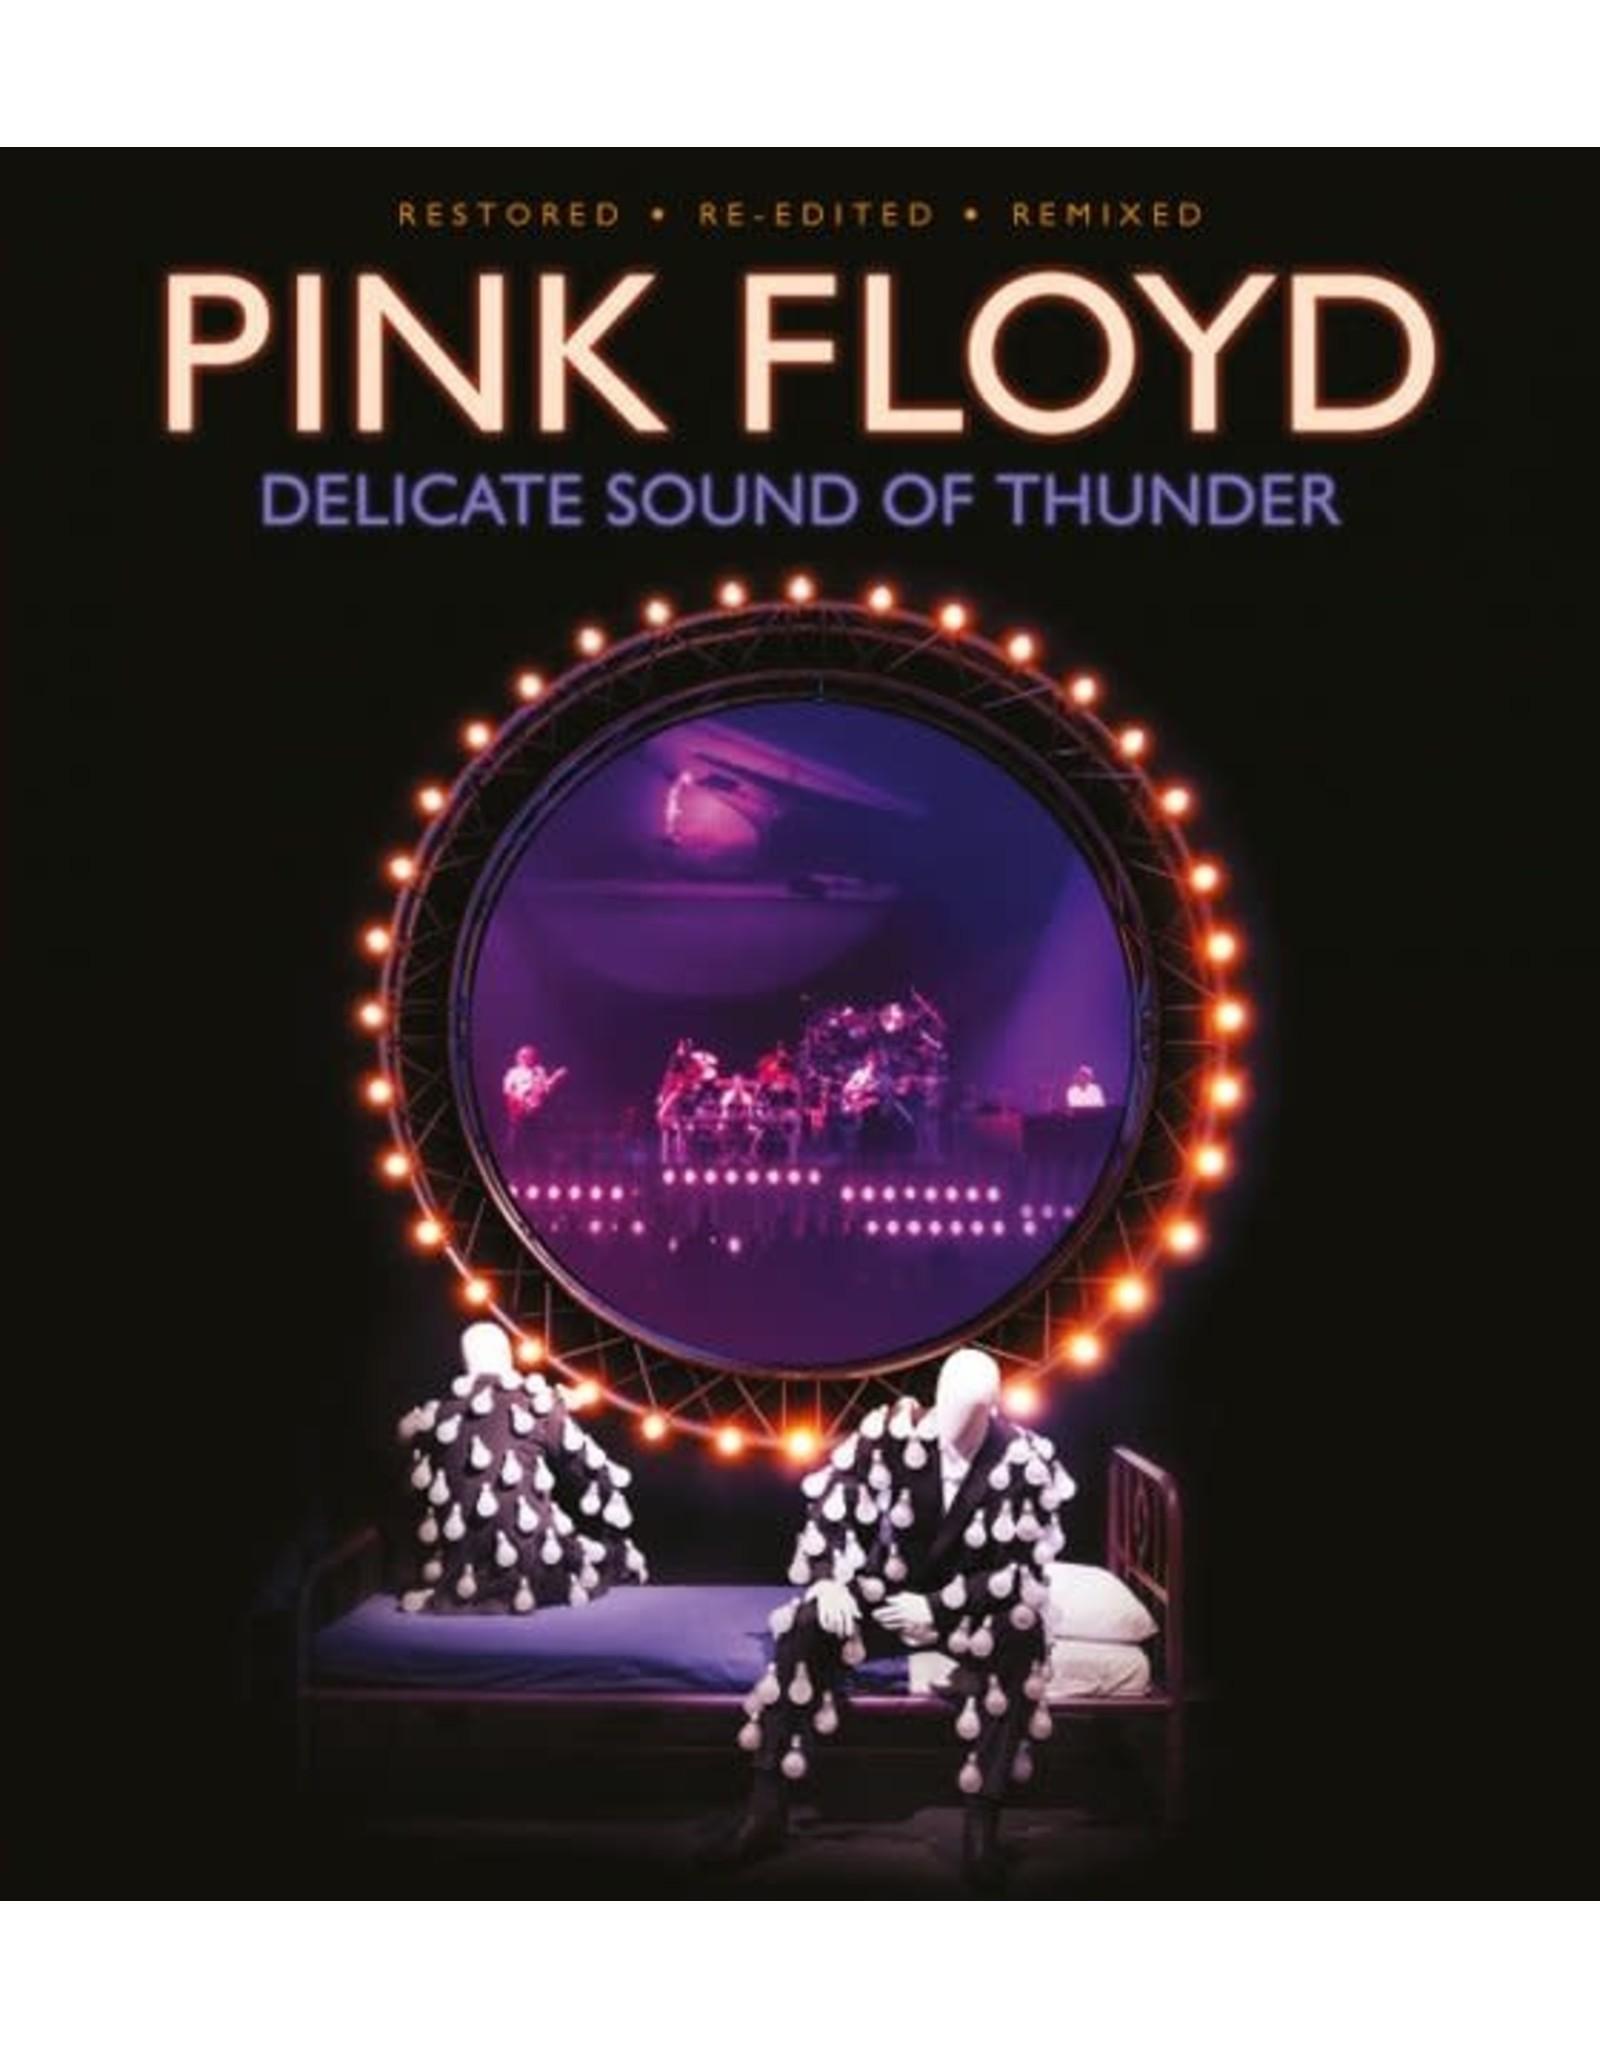 Pink Floyd - Delicate Sound of Thunder 3LP Boxset